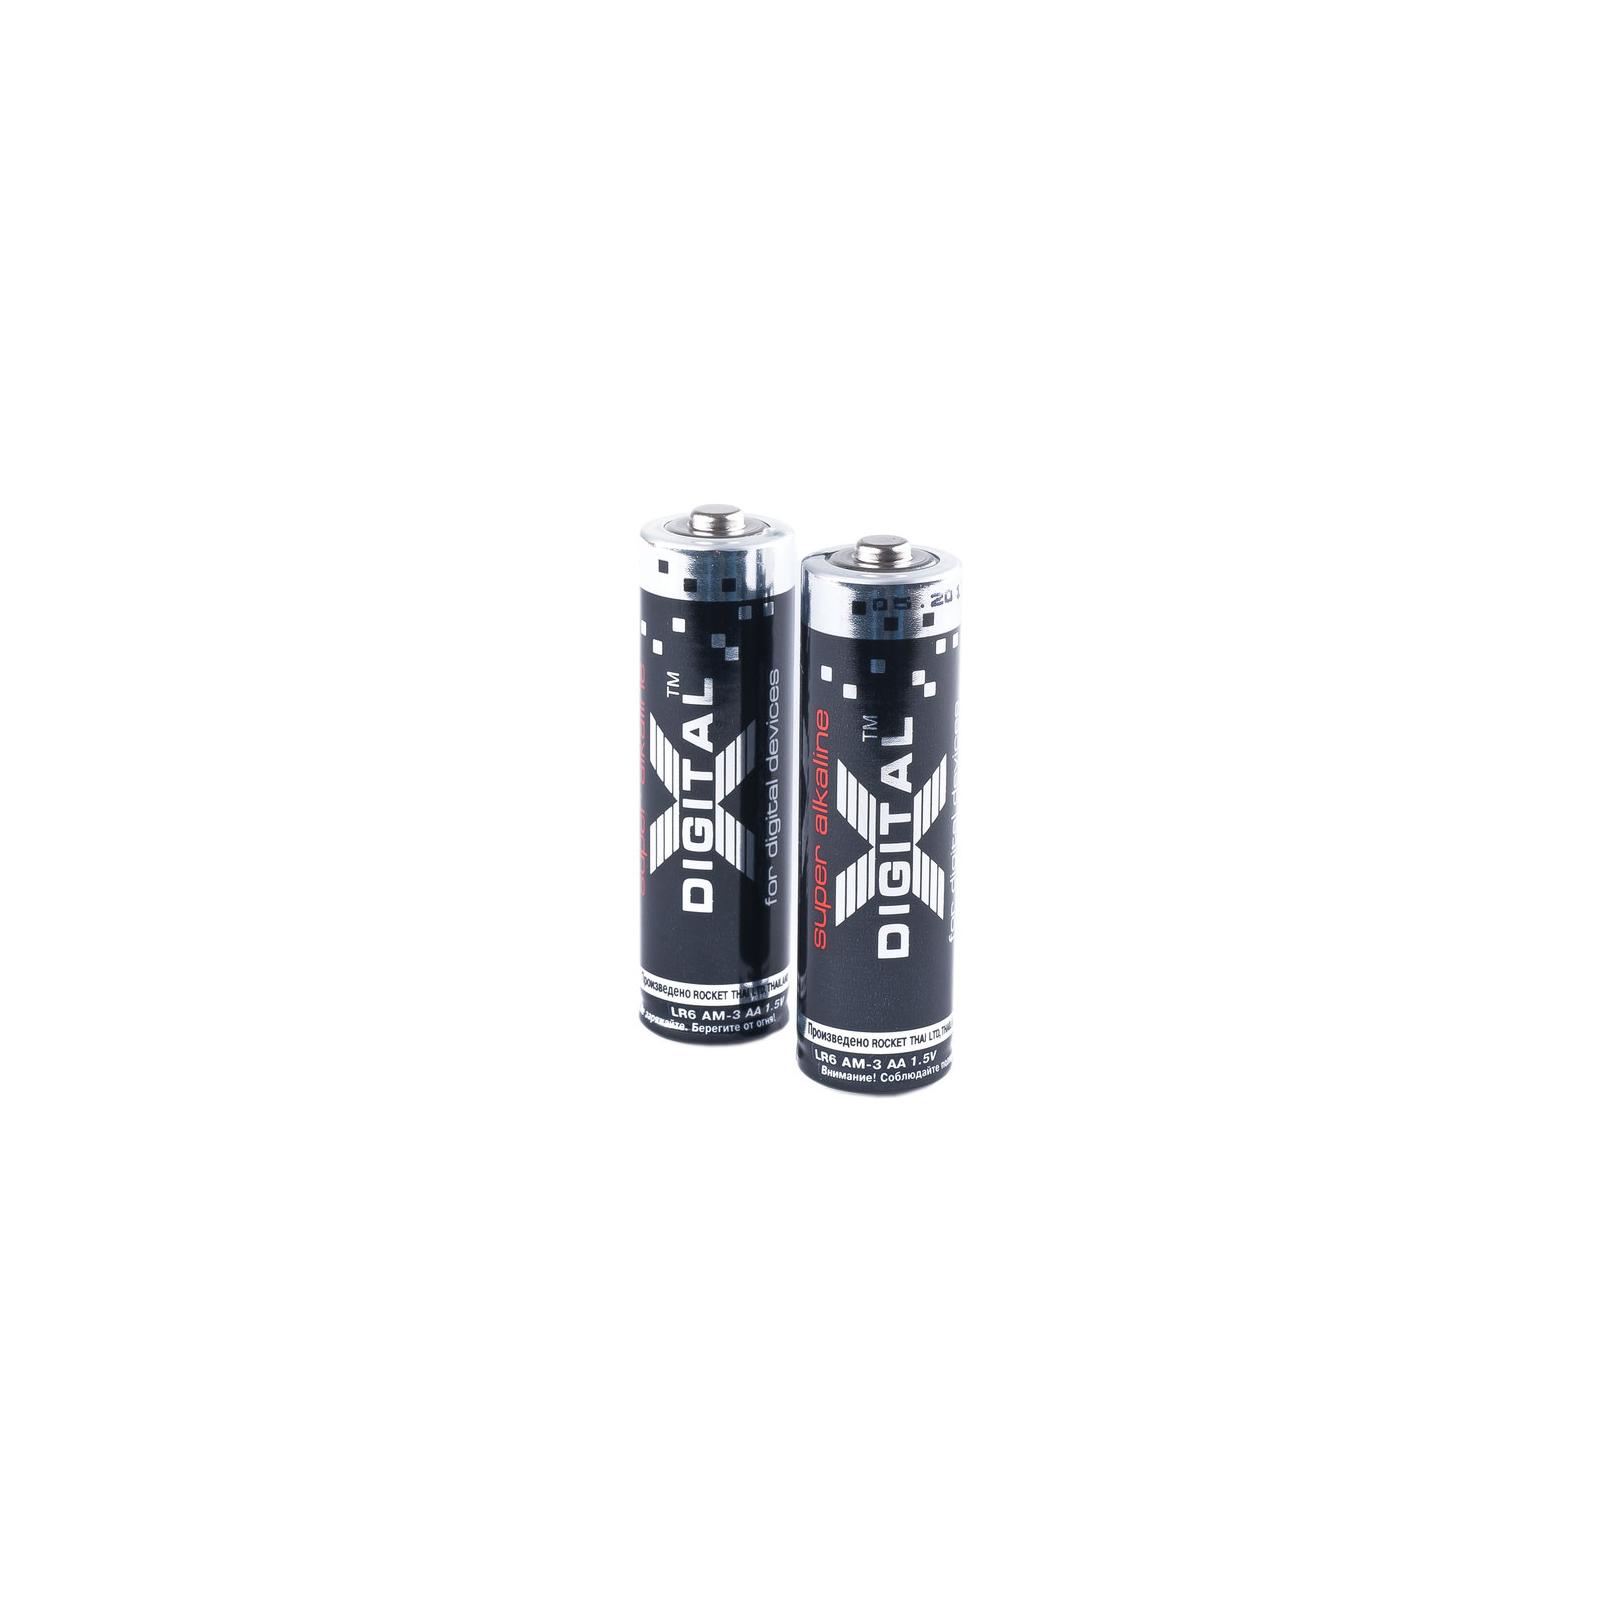 Батарейка X-DIGITAL LR06 X-DIGITAL * 2 (LR6(2SH) X-DIGITAL) изображение 2